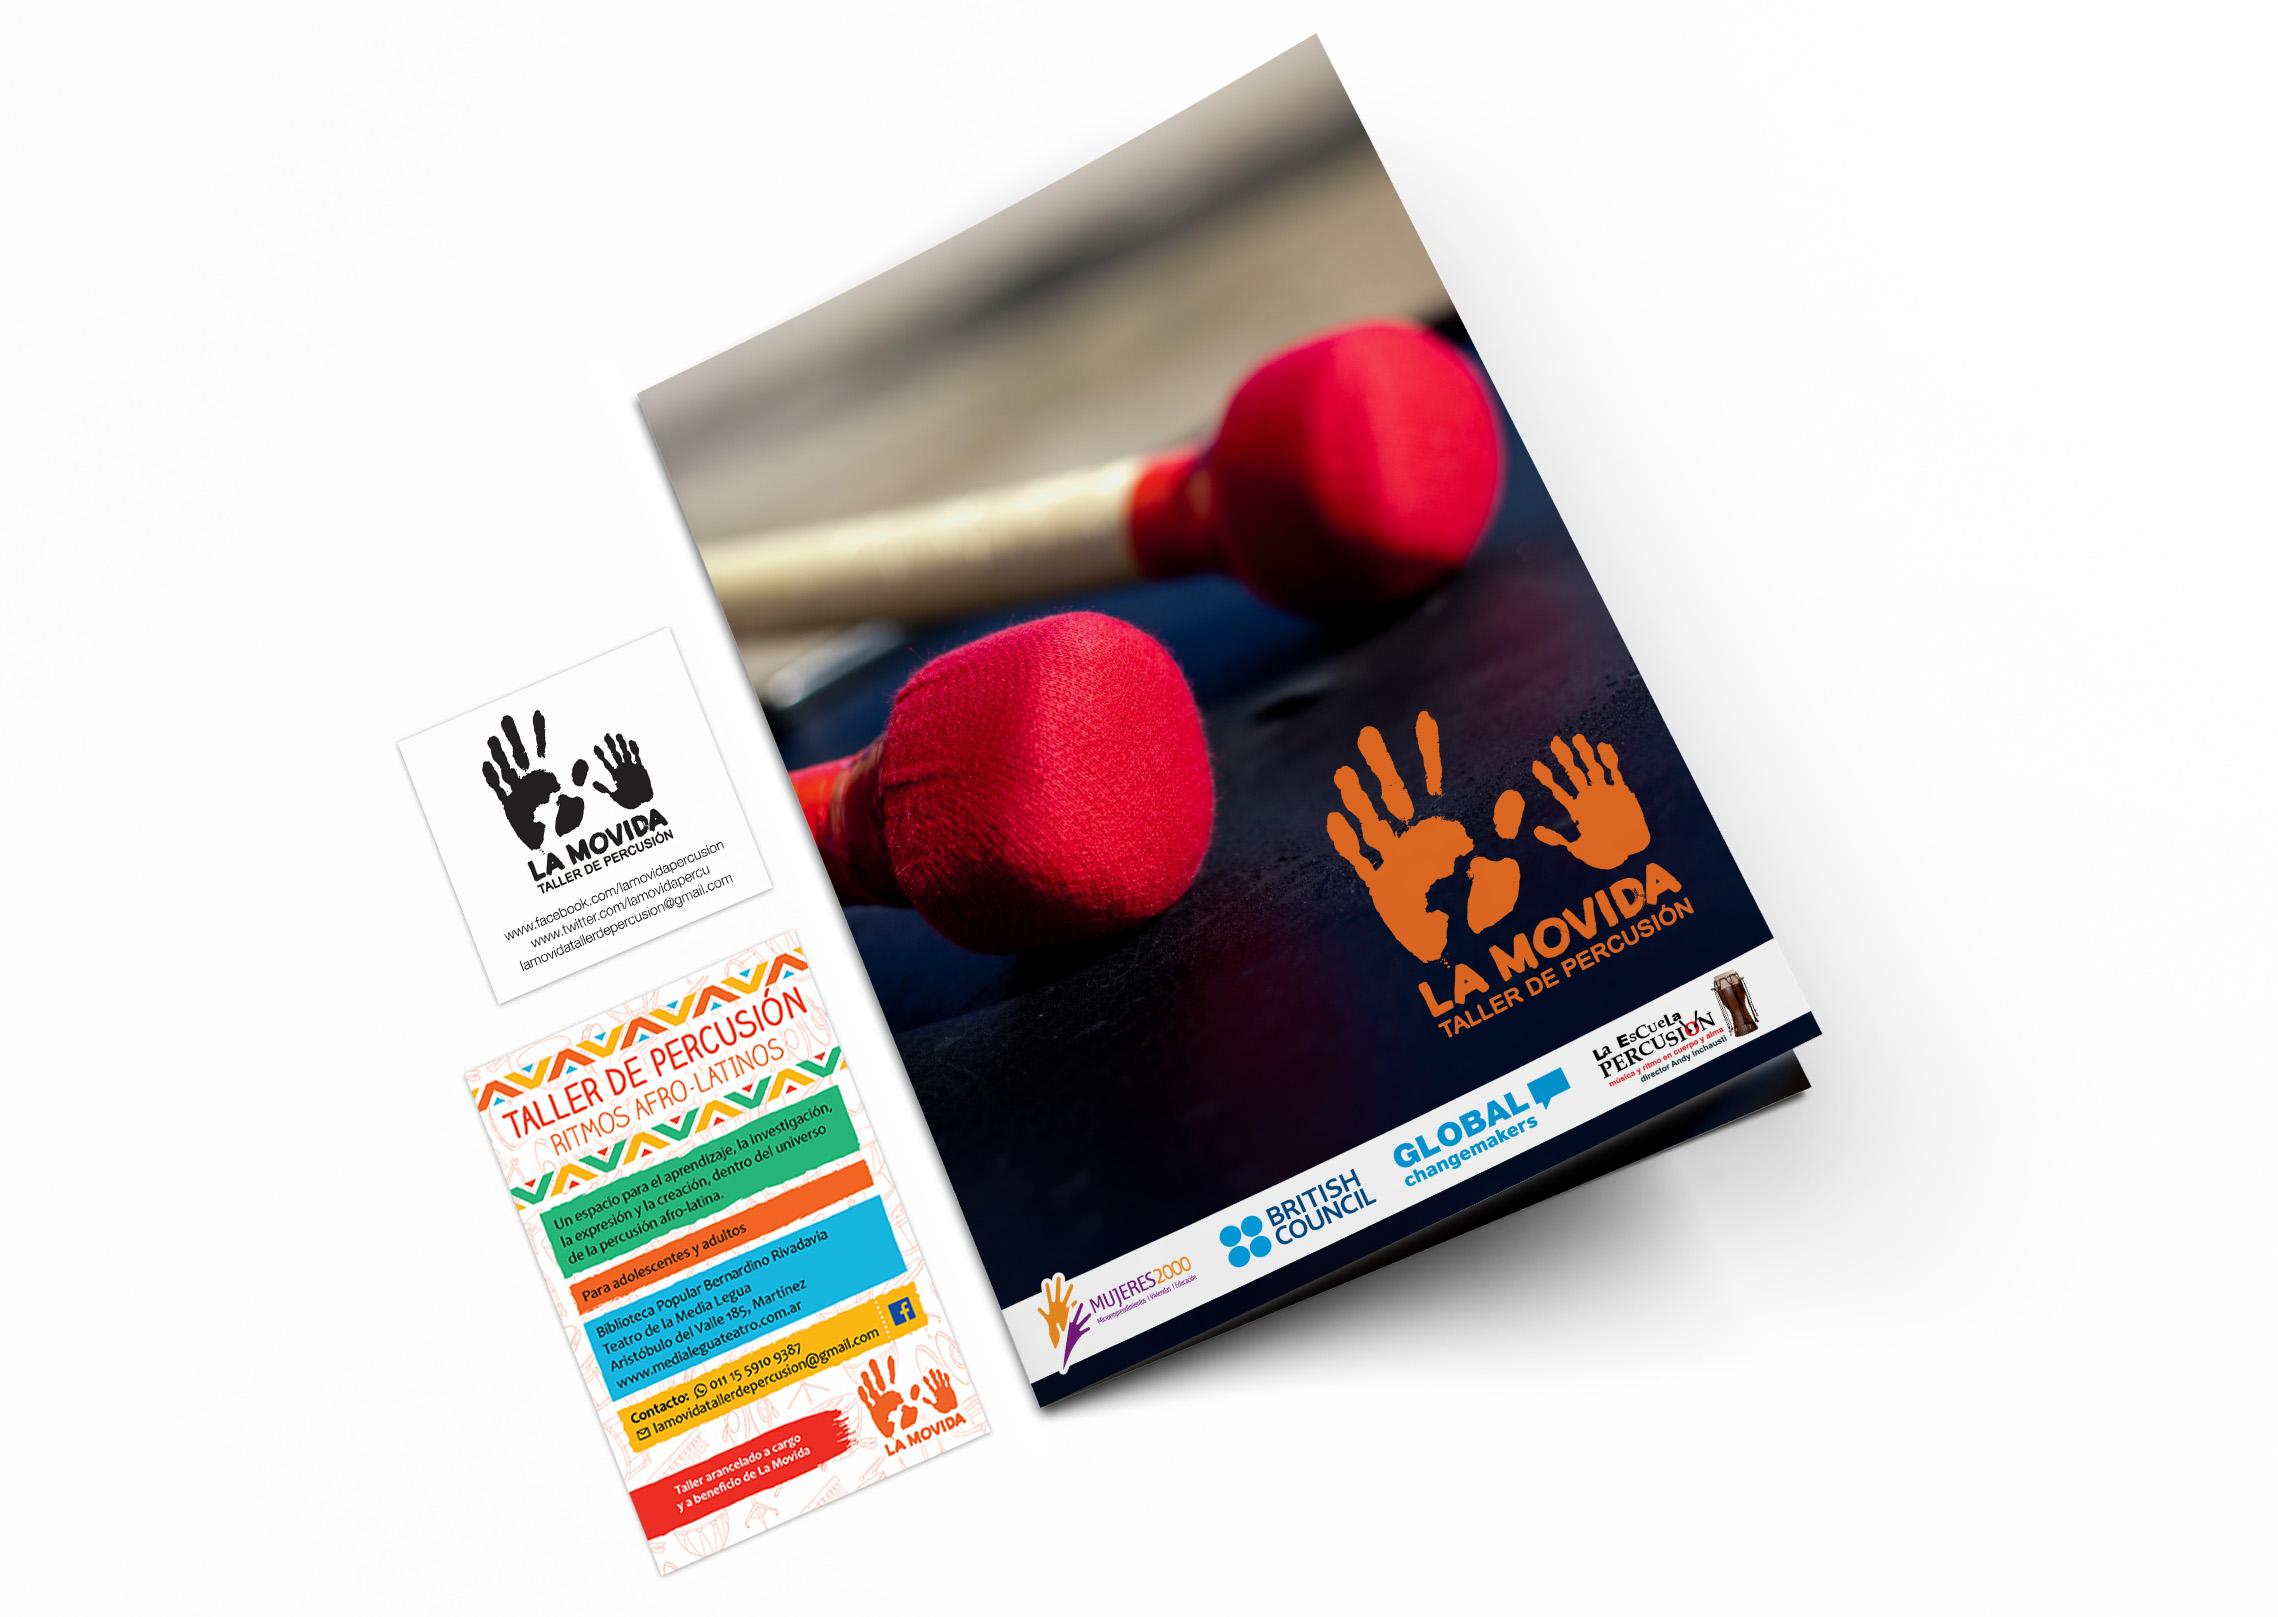 Bifold Brochure Mockup - La movida_web.jpg